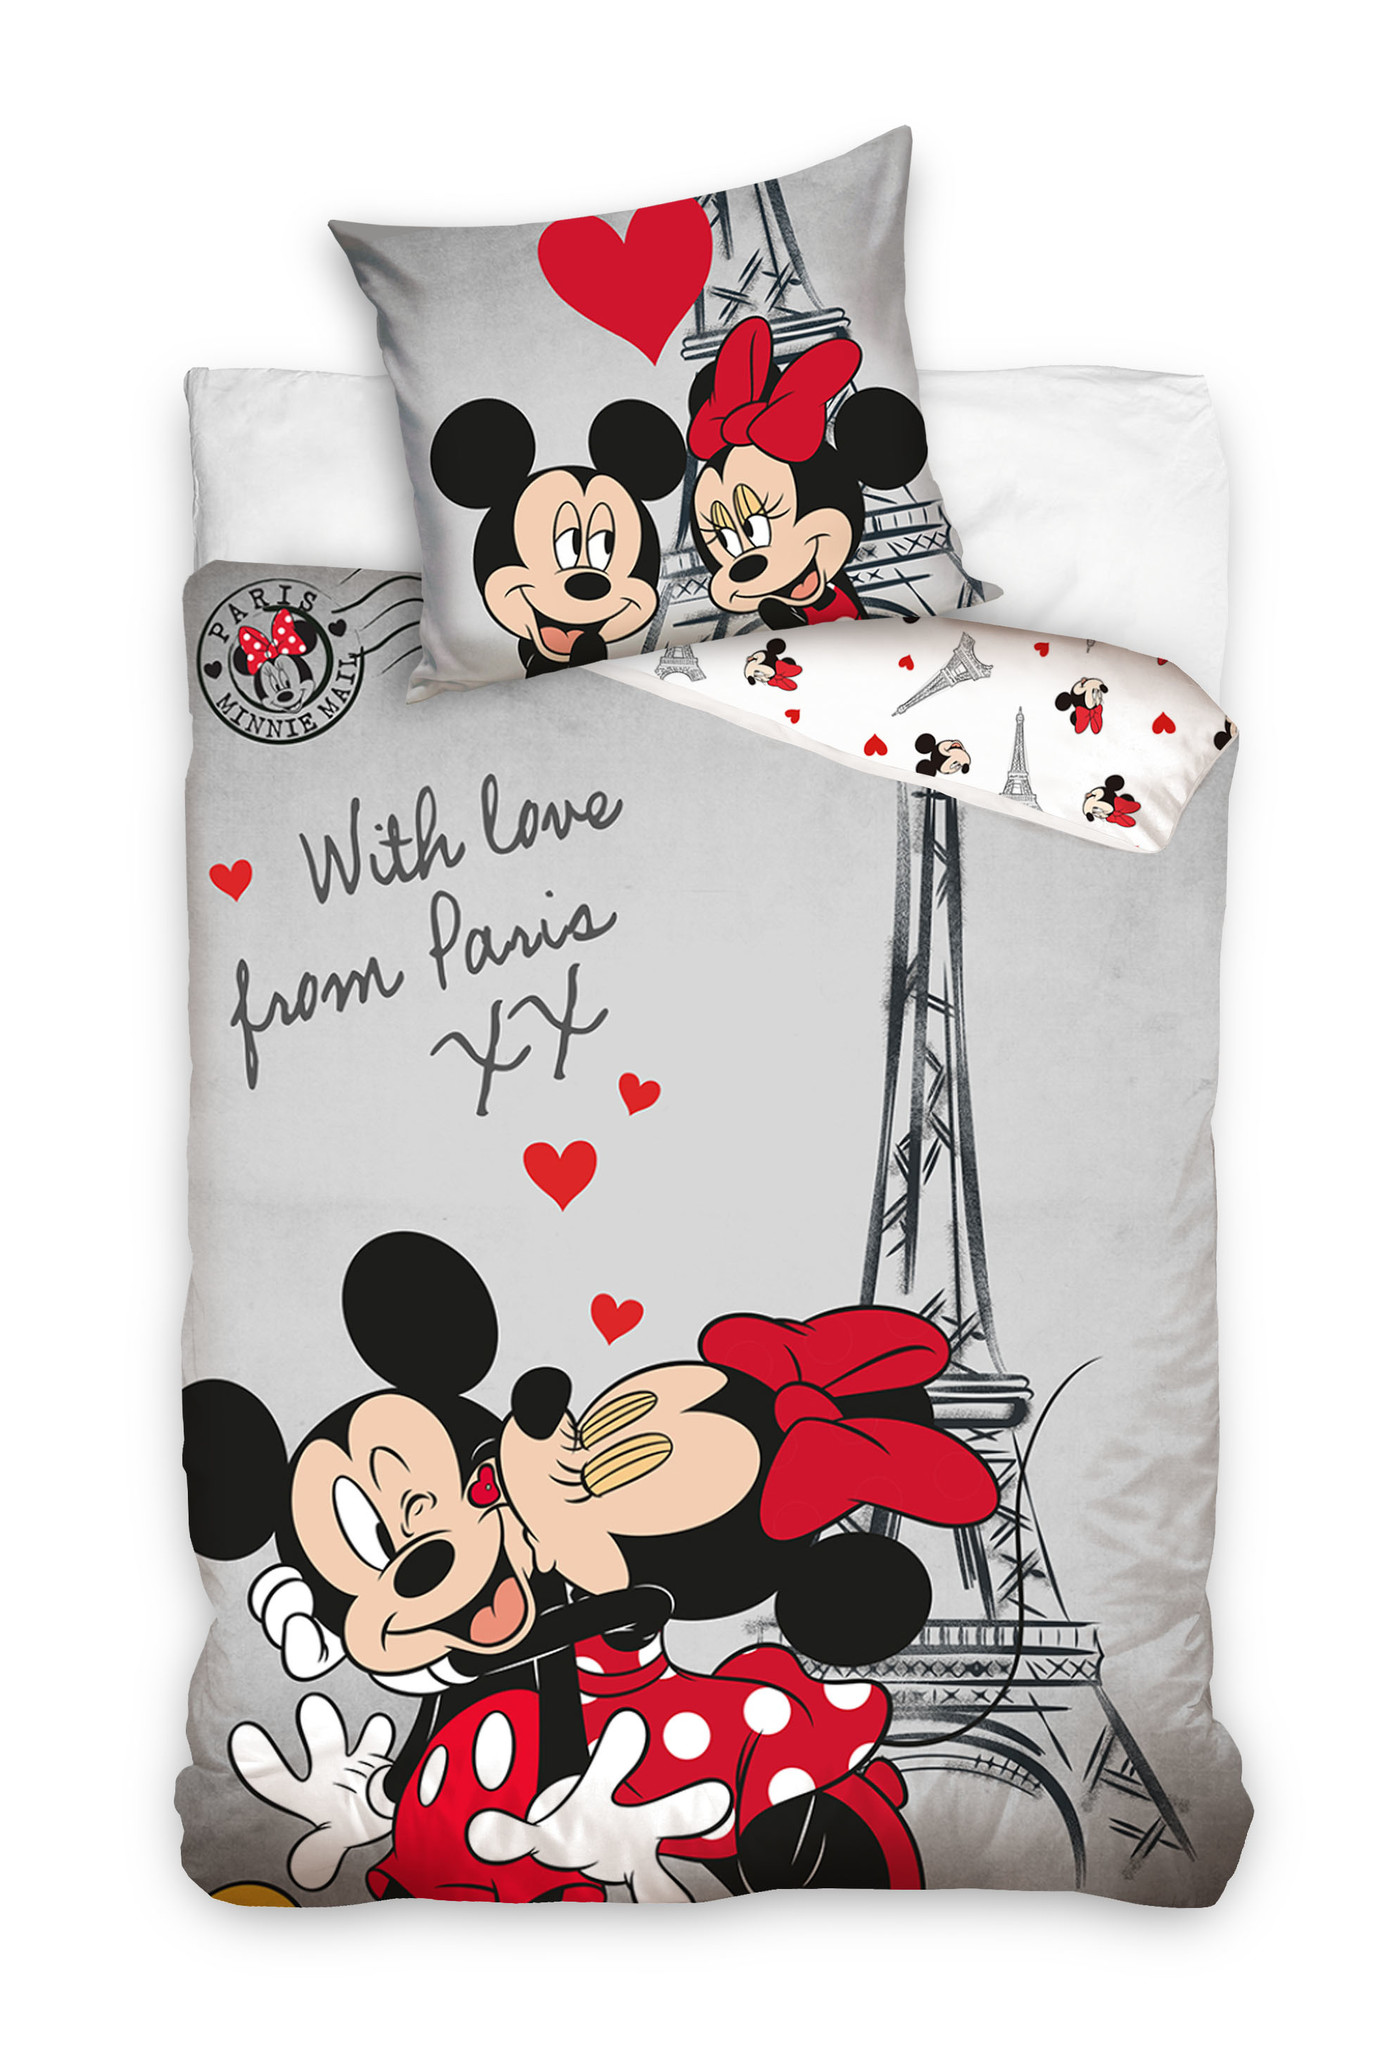 Disney Mickey Minnie Mouse Dekbedovertrek Parijs